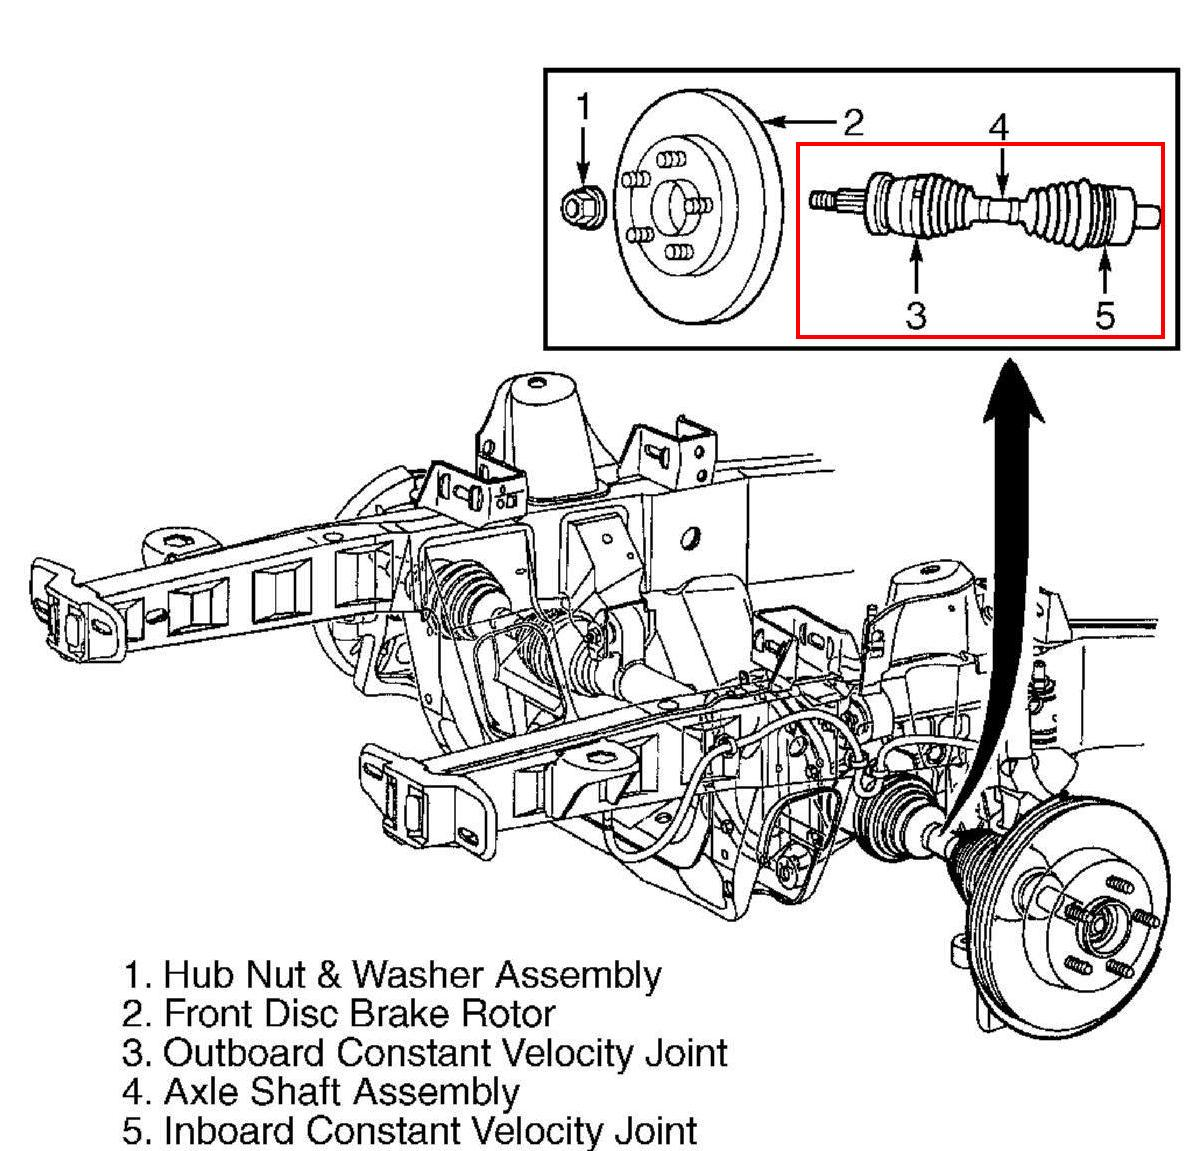 2011 04 23_162321_fe1 2000 ford explorer front end diagram electrical wiring diagram \u2022